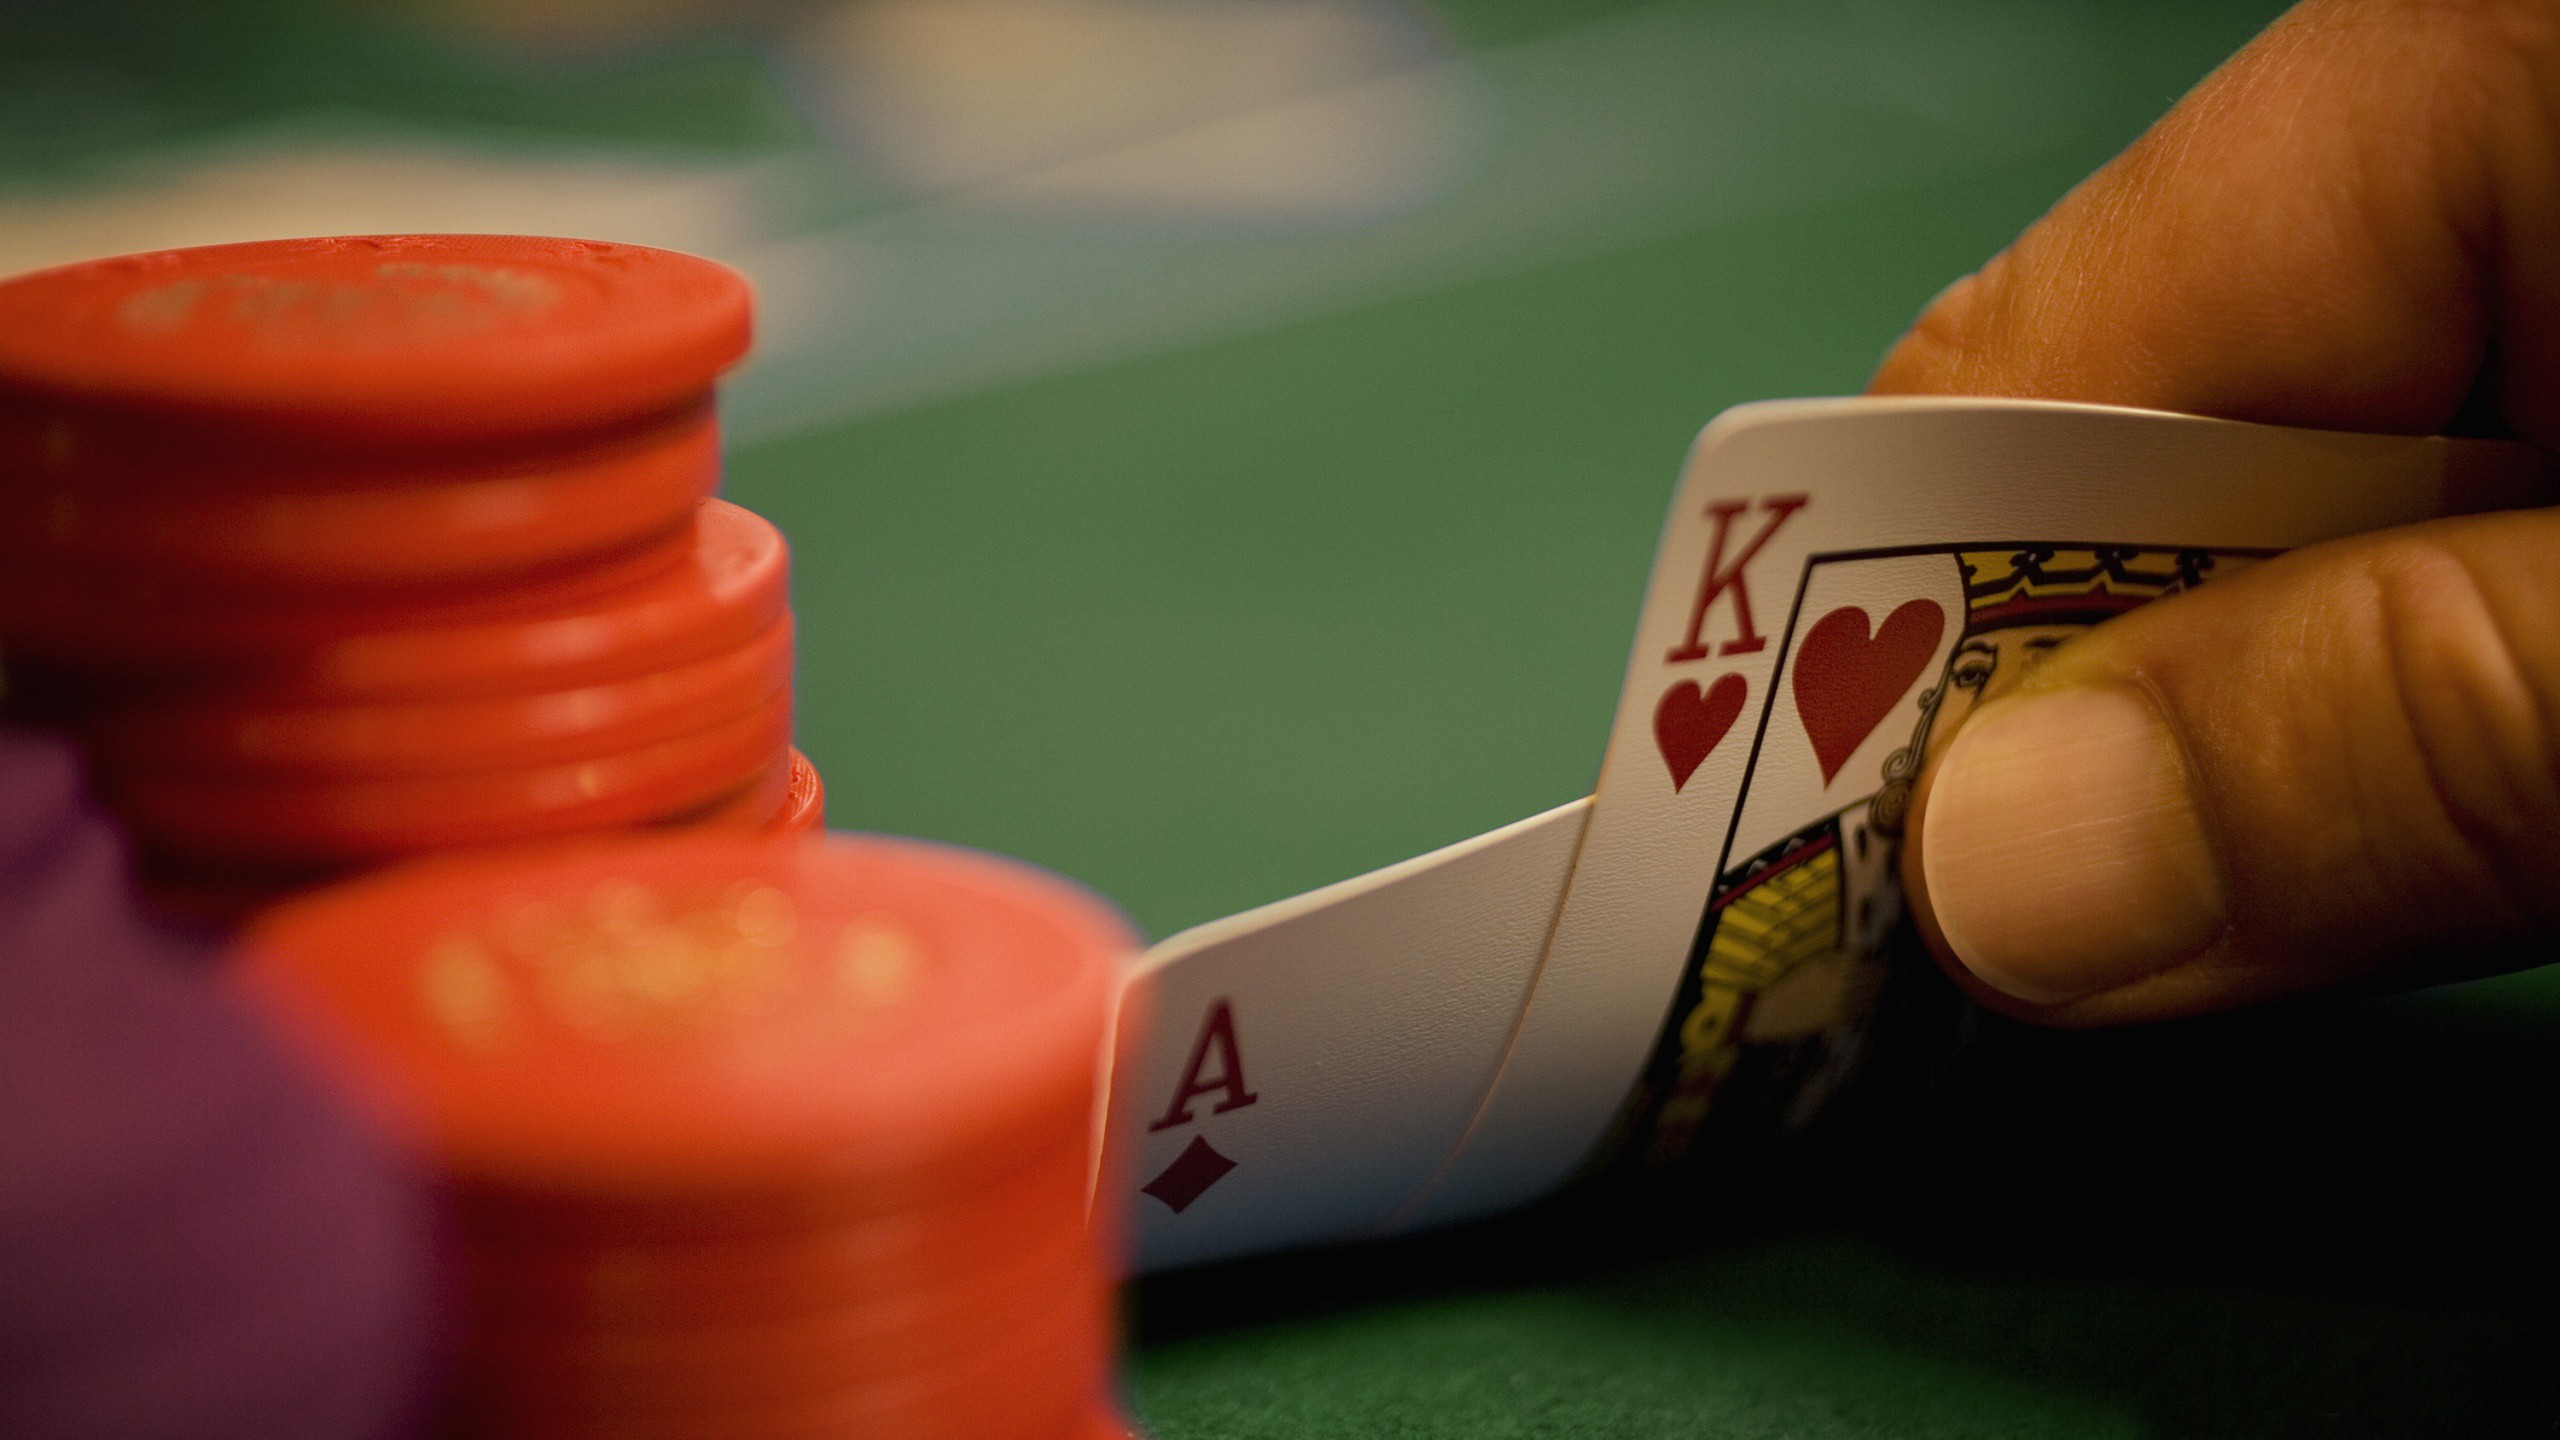 cards poker Ace king poker chips game Poker Table wallpaper background 2560x1440